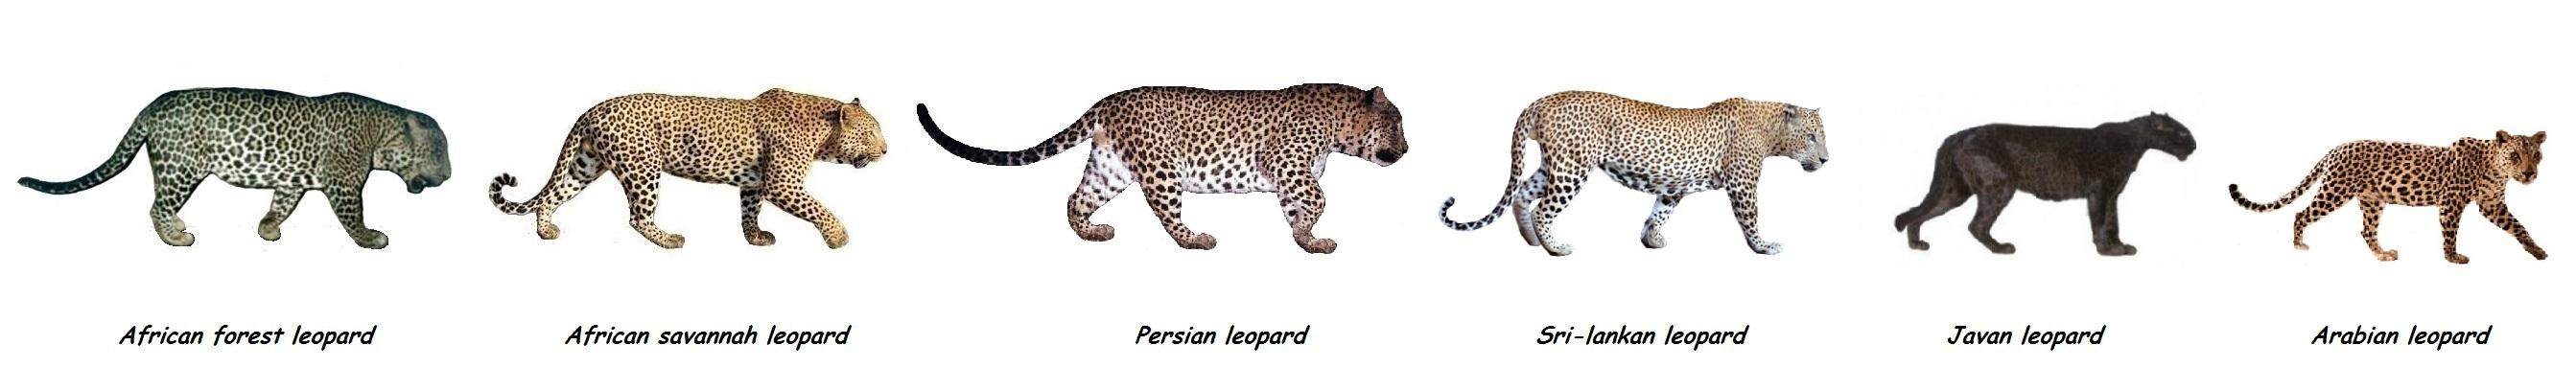 Jaguar venezuelano VS Leopardo macho monstro 1353599632-leopard-subspecies-comparison-all